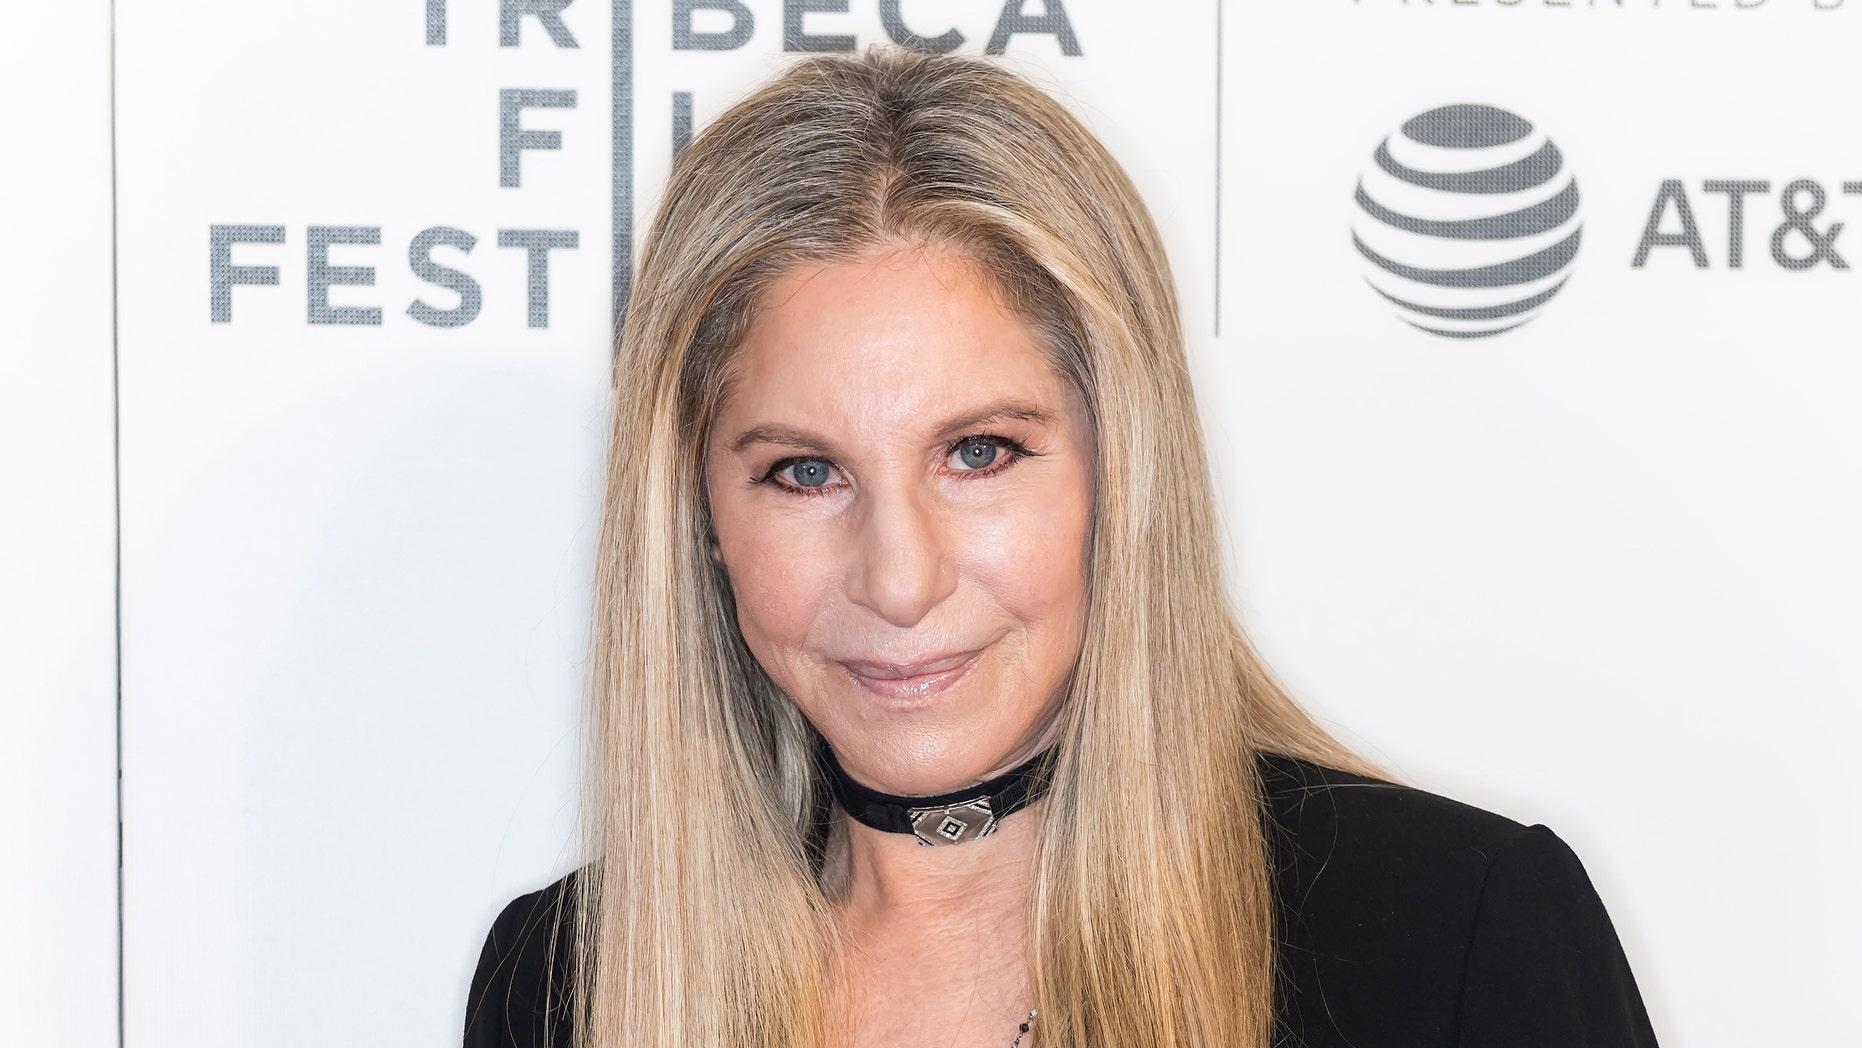 Barbra Streisand attends Tribeca Talks: Storytellers on April 29, 2017 in New York City. (Photo by Gilbert Carrasquillo/FilmMagic)